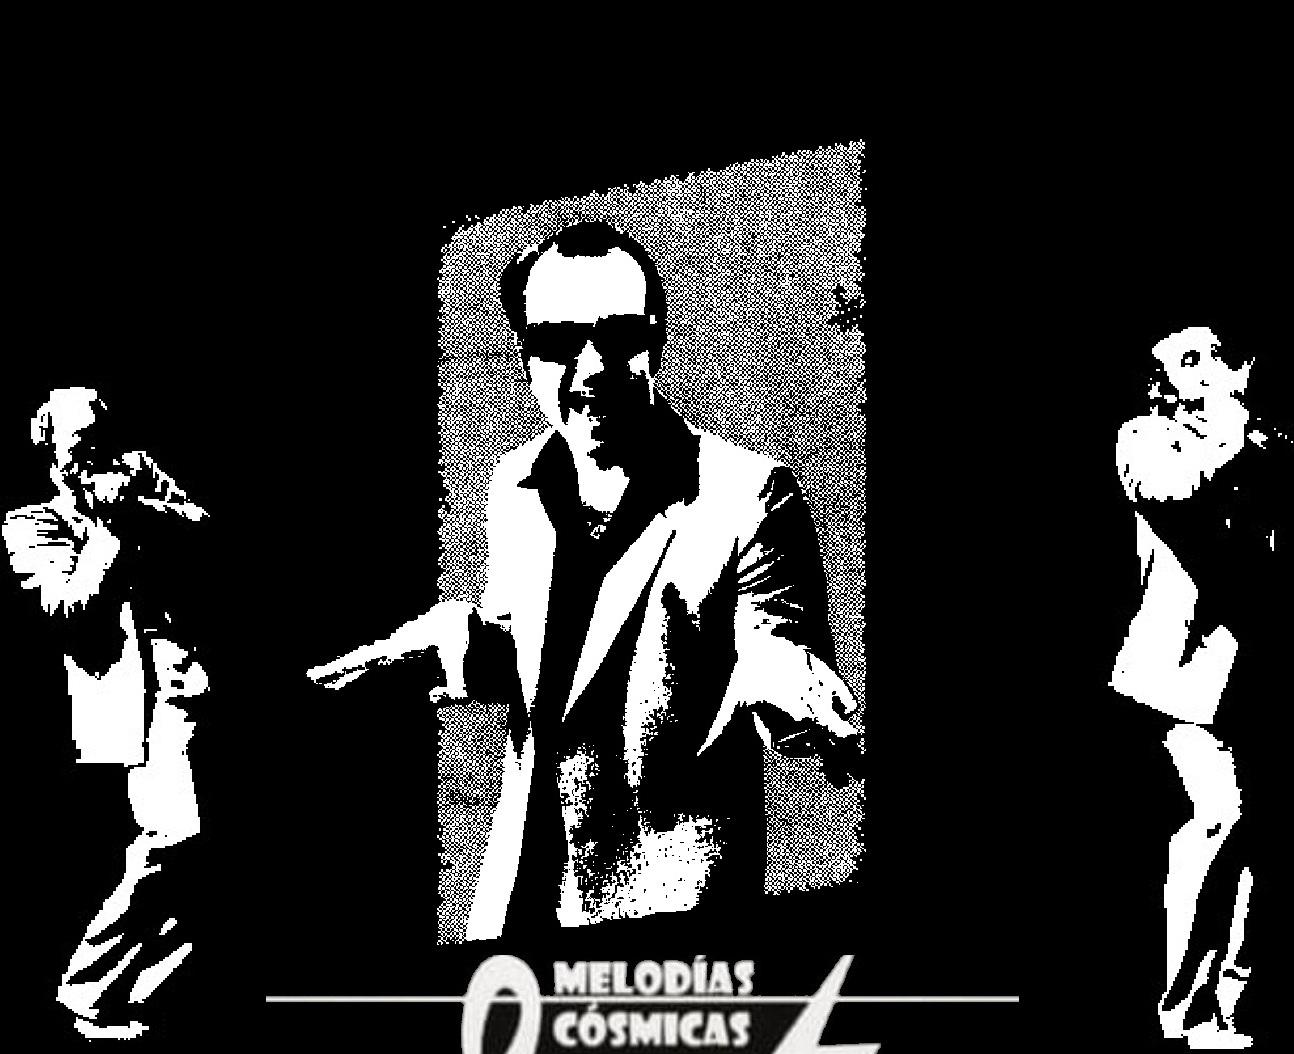 Podcast Melodías Cósmicas. Fabulous Thunderbirds más novedades.